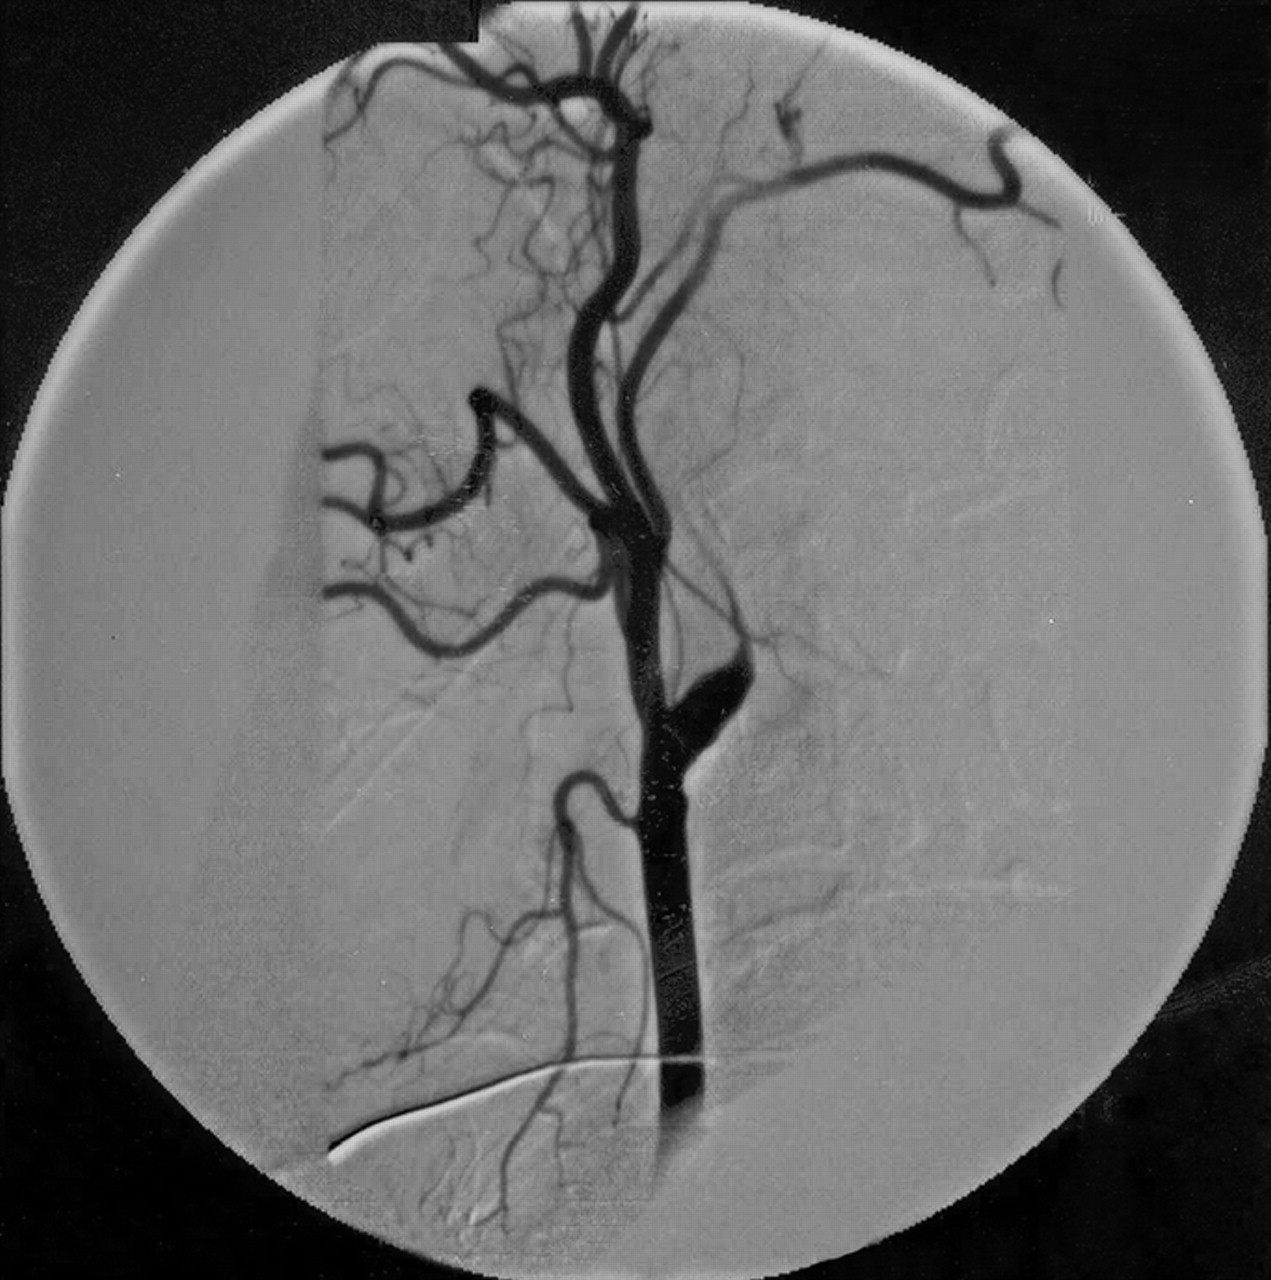 Carotid t Occlusion Carotid Artery Occlusion